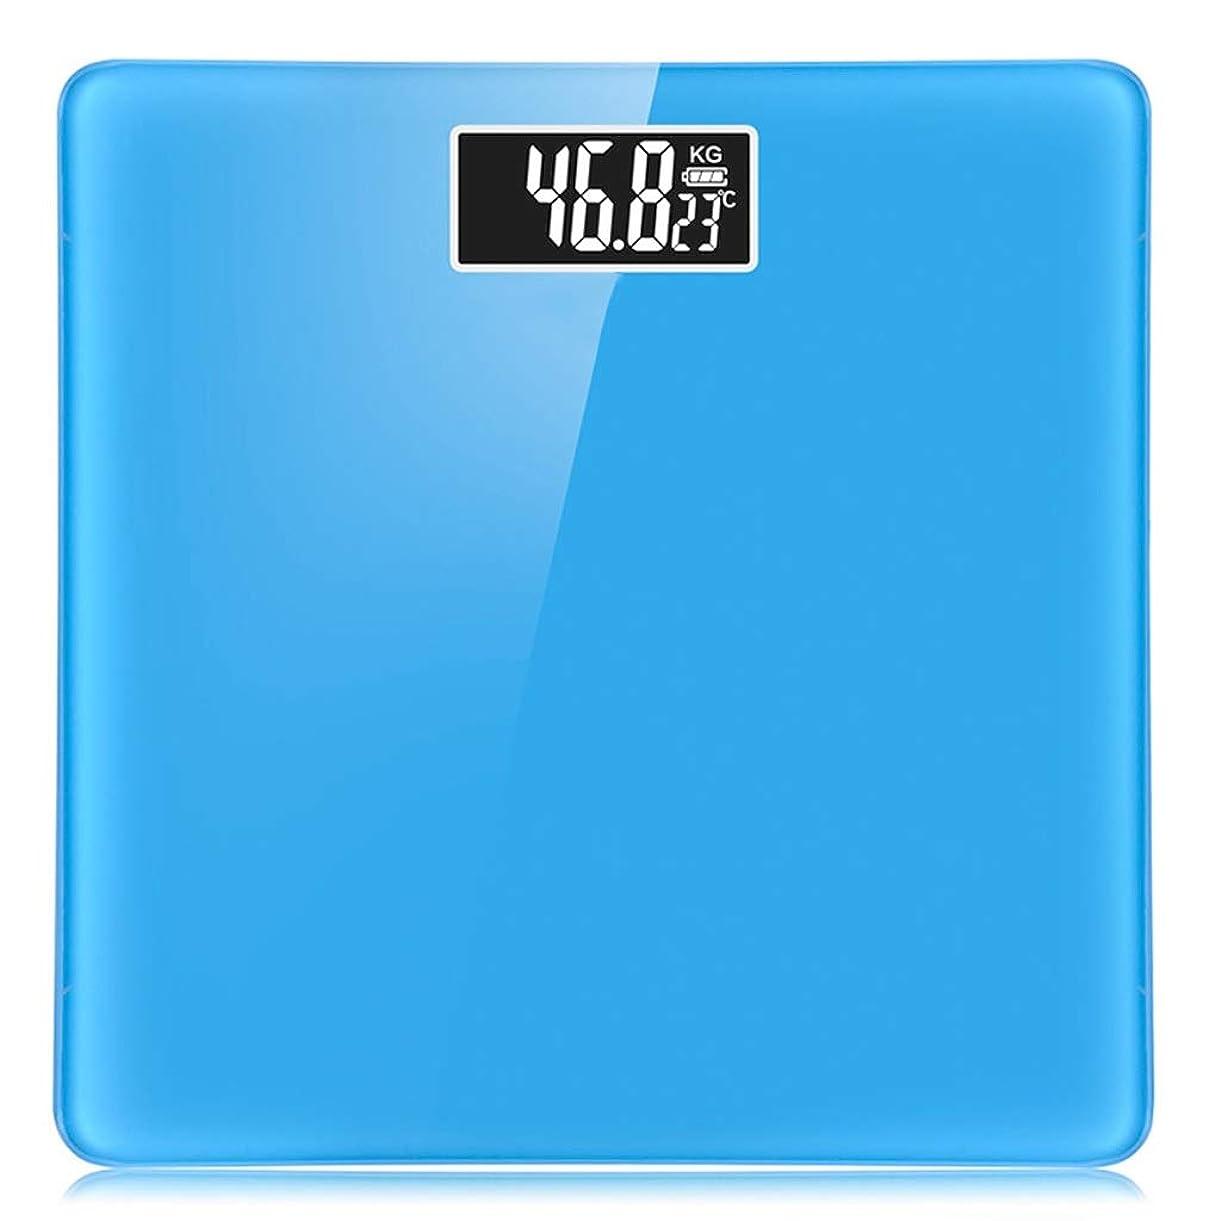 スプーン攻撃的葡萄体重計電子体重計体重計家庭用電子体重計体重計体重計健康スケール精密計量 ZHJING